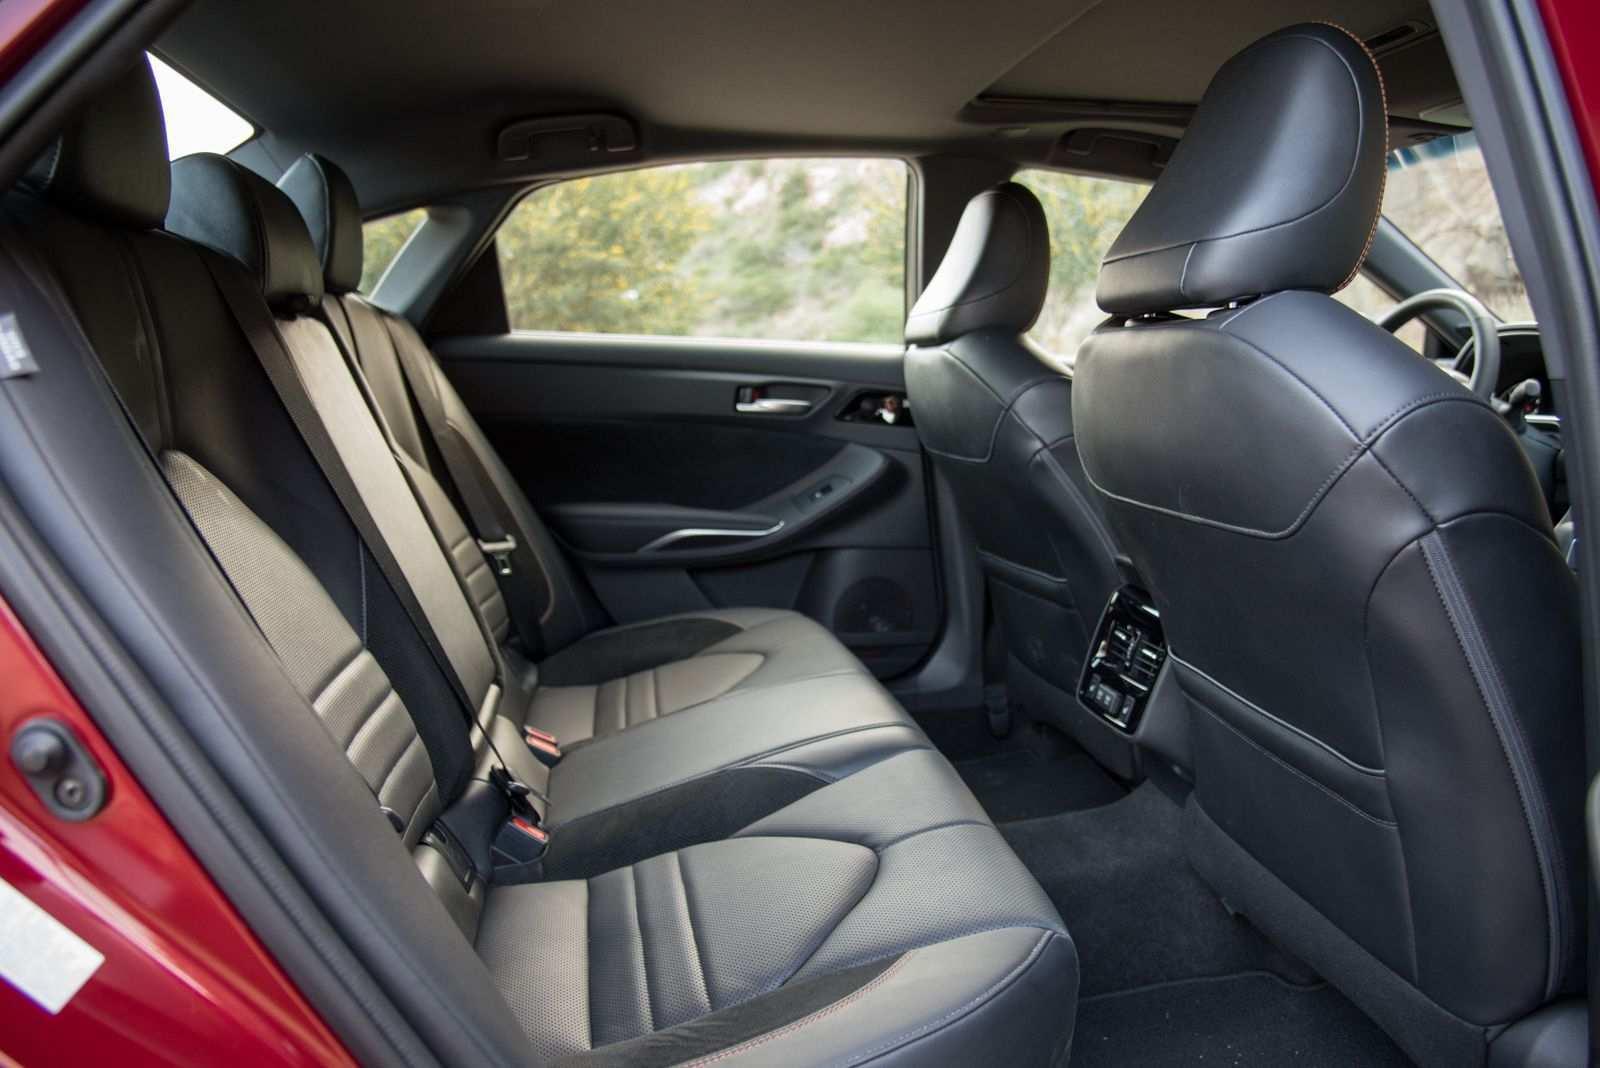 73 All New Best Avalon Toyota 2019 Interior Concept Style for Best Avalon Toyota 2019 Interior Concept